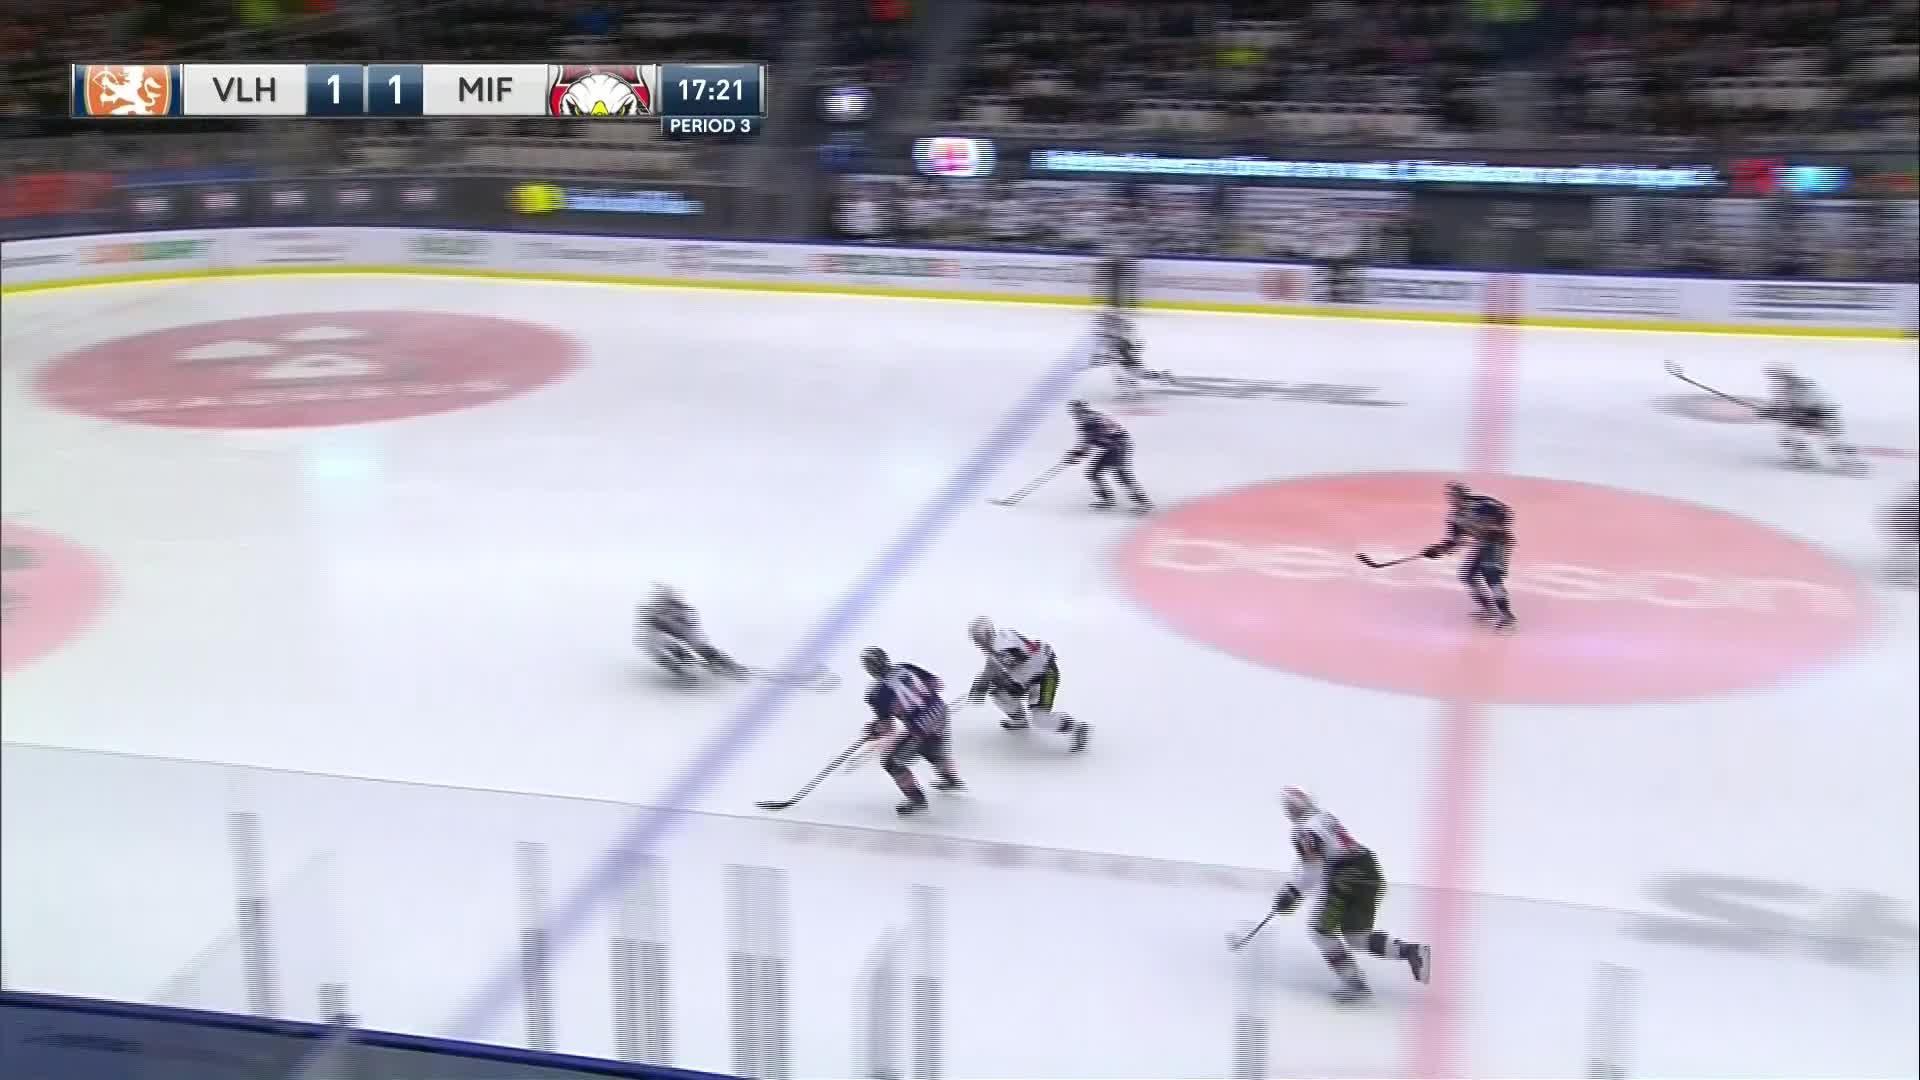 Växjö Lakers - Malmö Redhawks 2-1